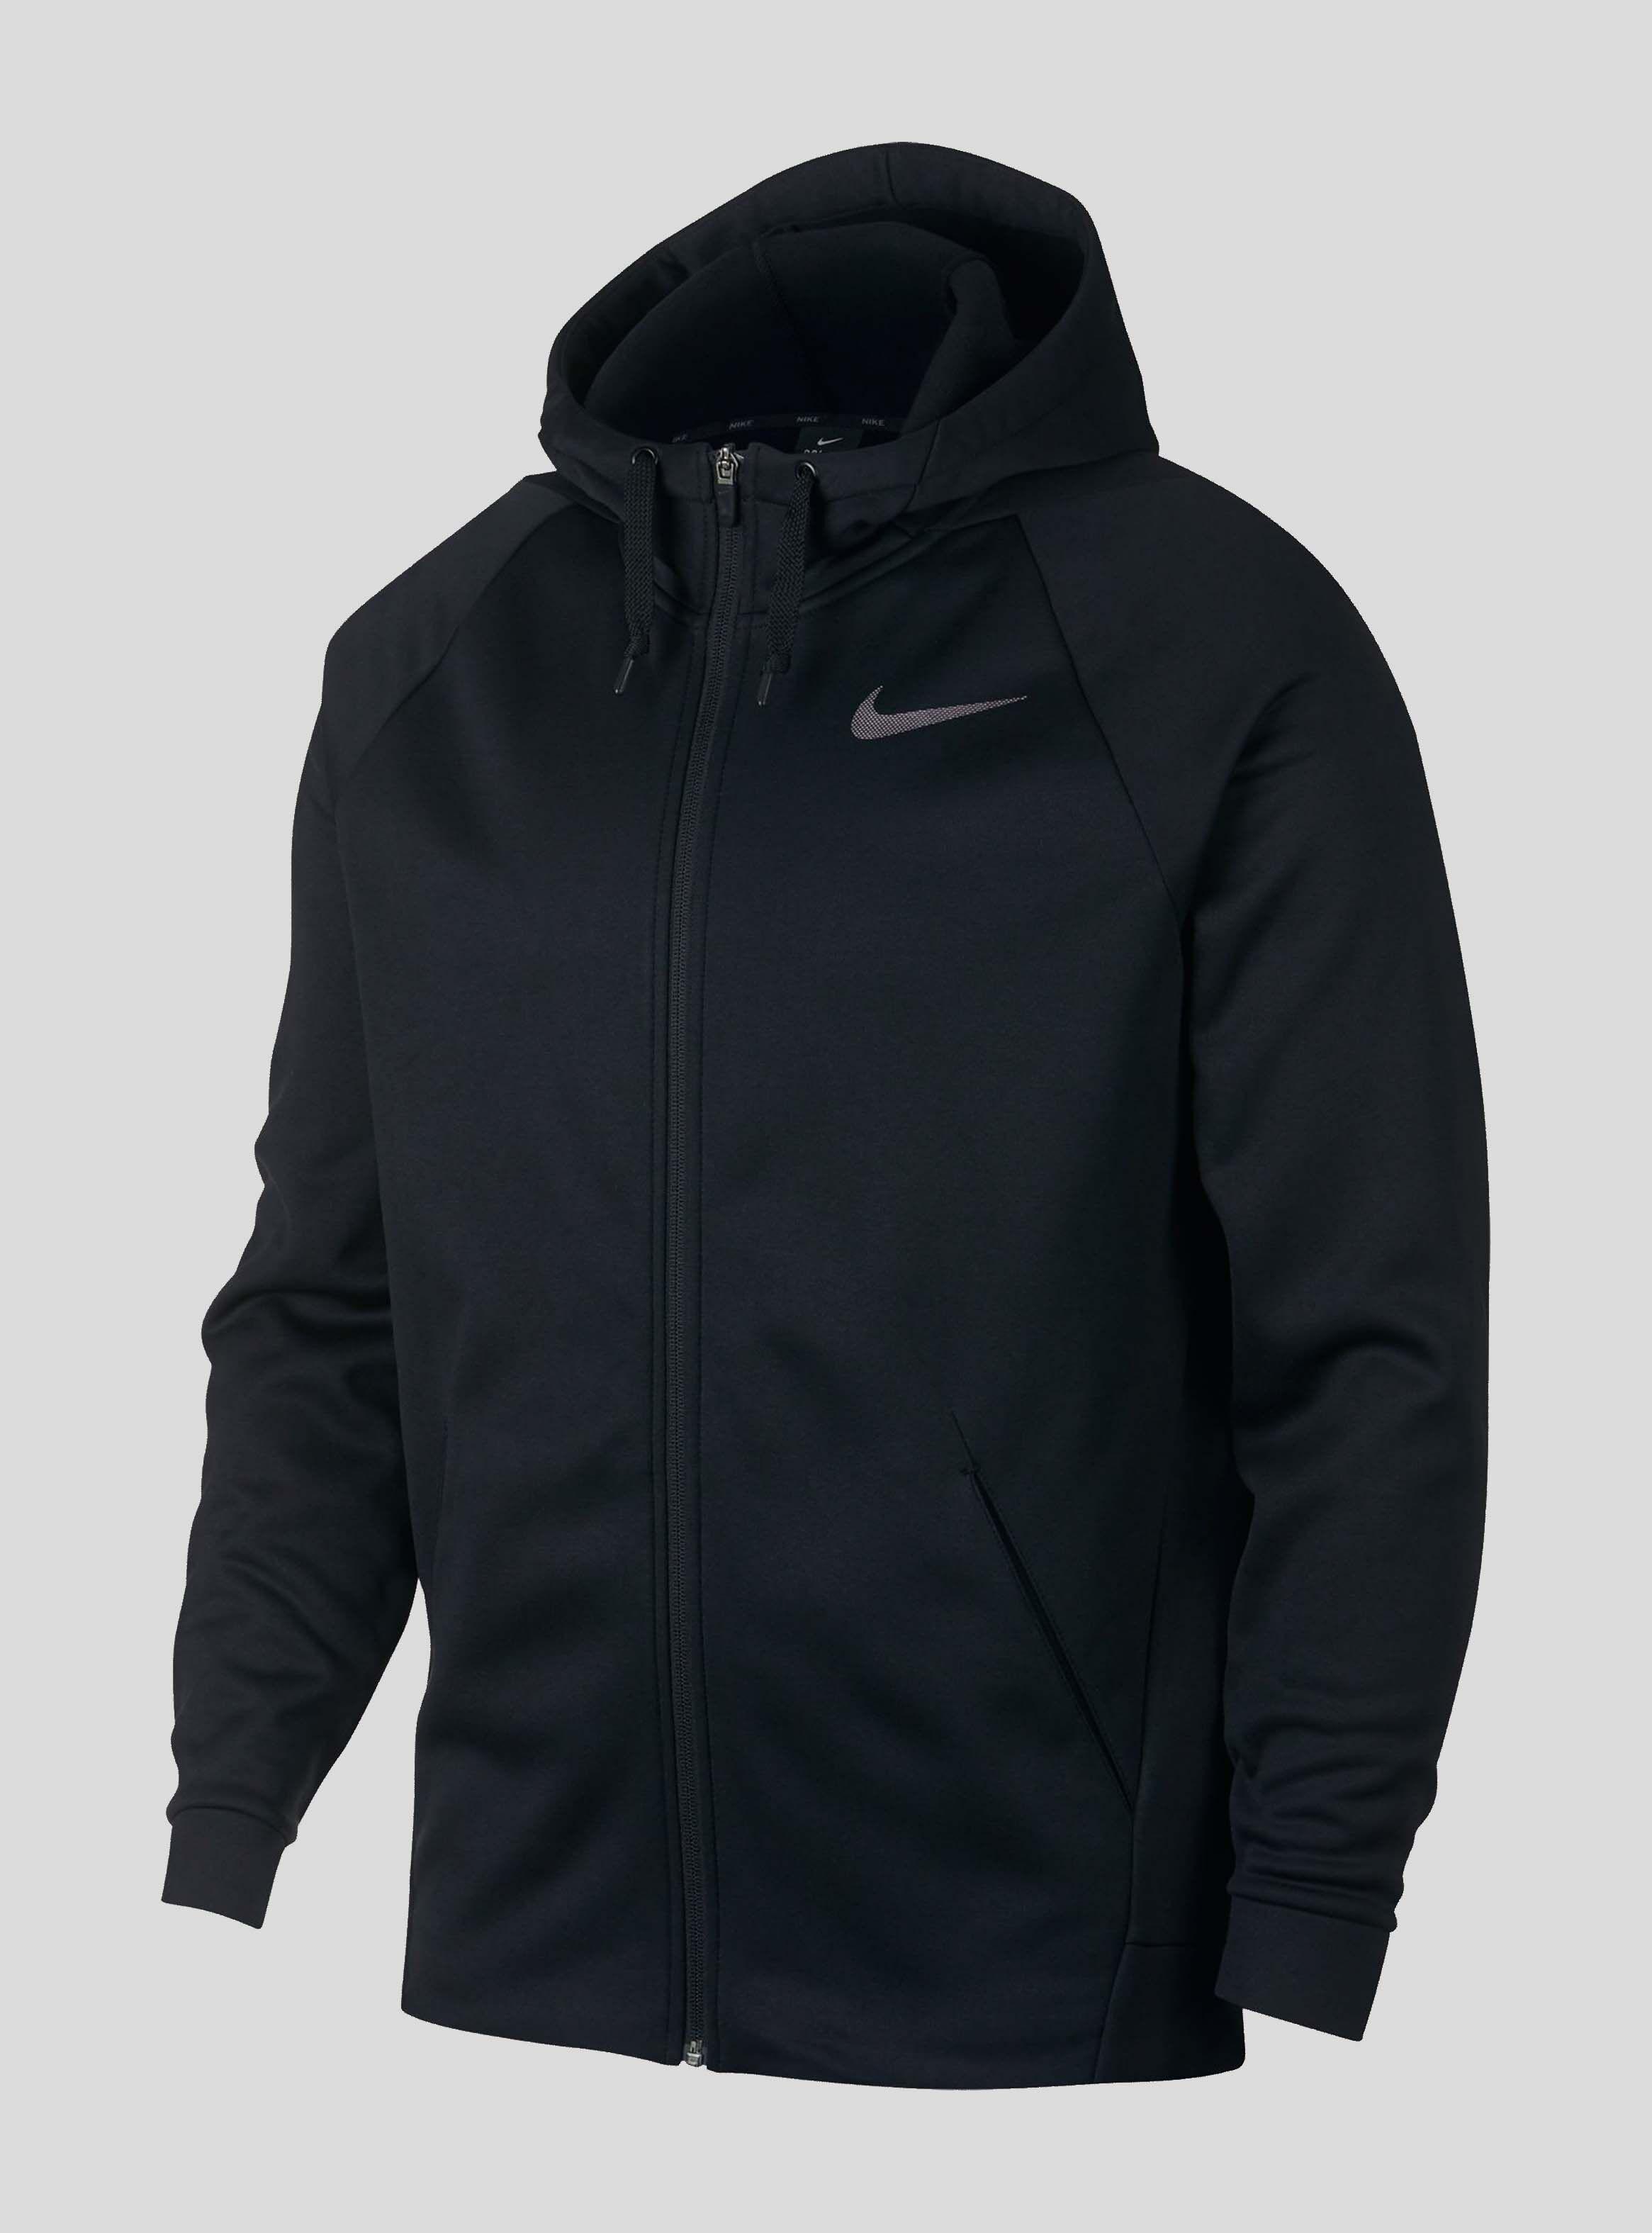 Polerón Nike Dri-FIT Therma Training Hombre